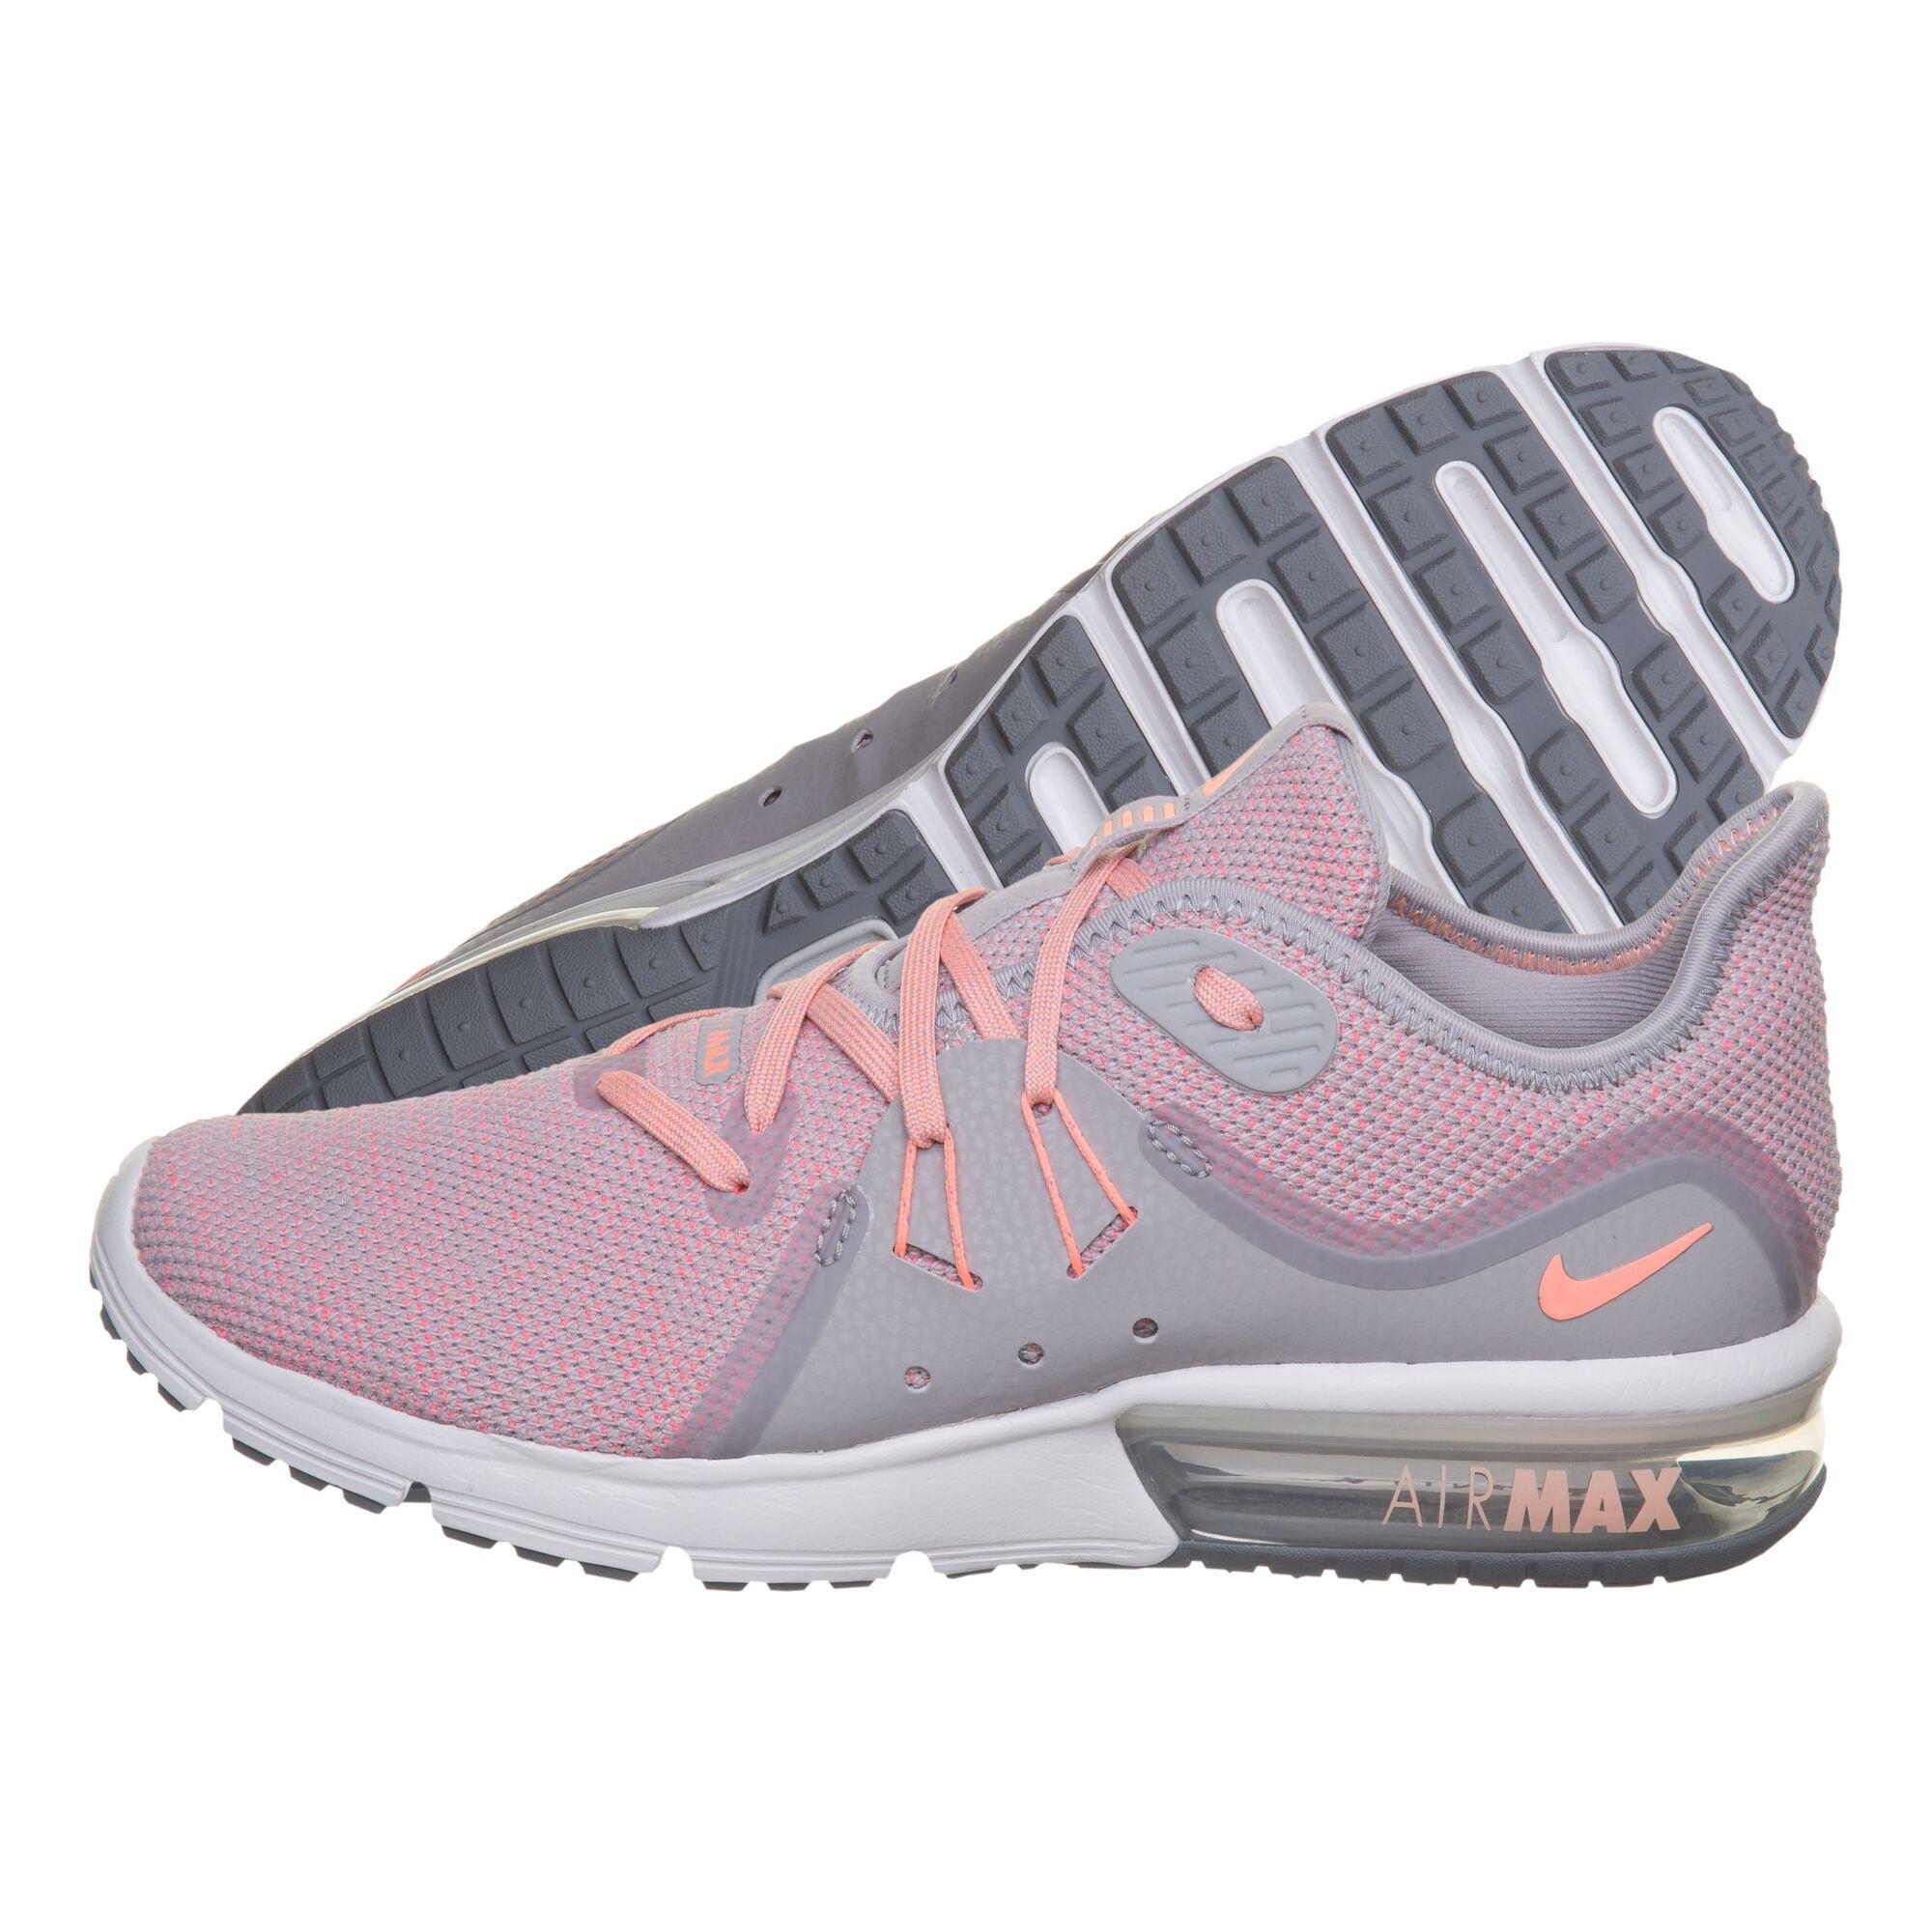 fce4d539b75f88 ... Nike · Nike · Nike · Nike · Nike · Nike. Air Max Sequent 3 Women ...